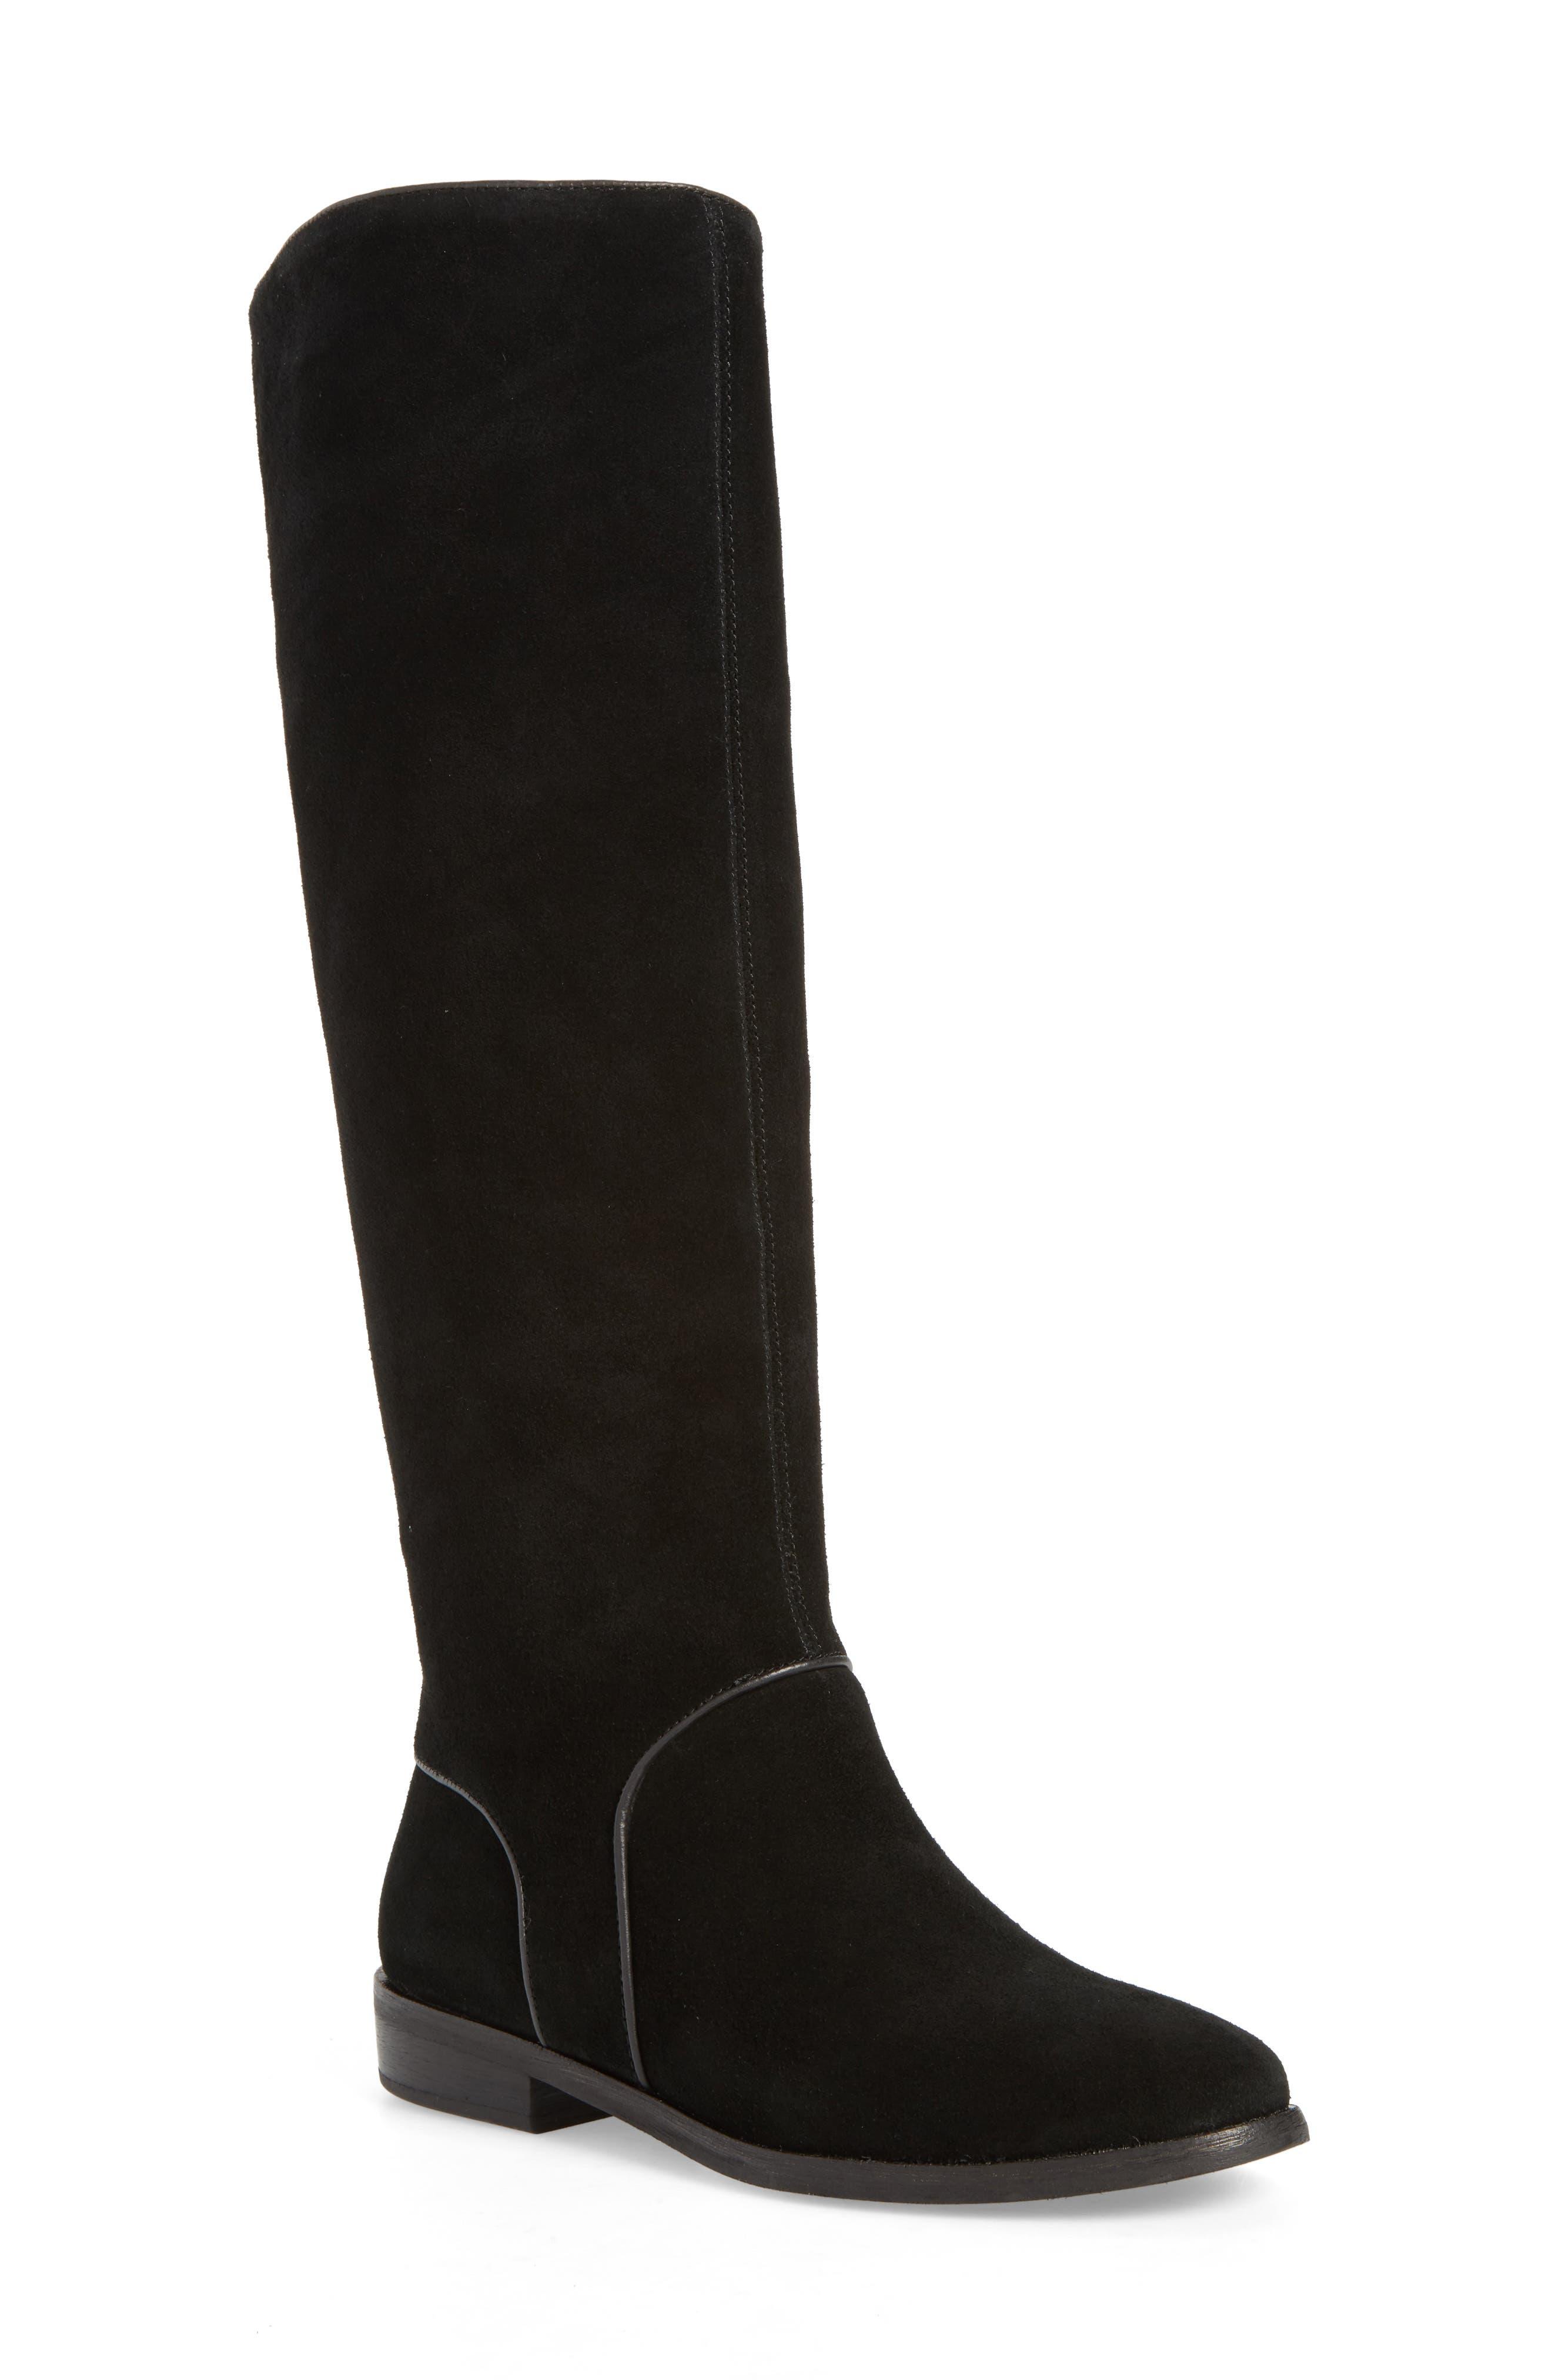 Gracen Knee High Boot,                         Main,                         color, 001